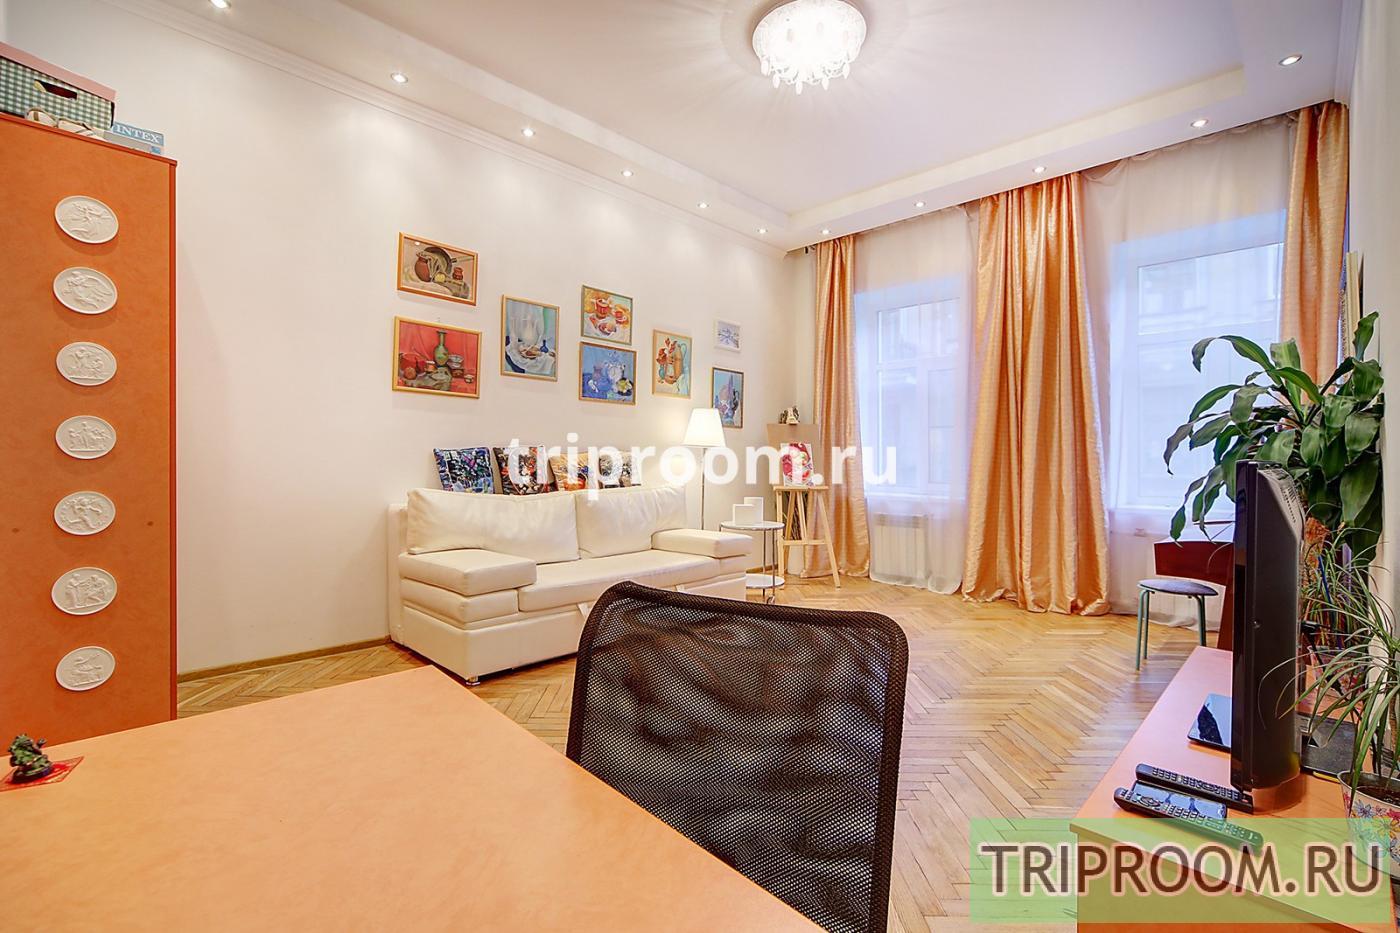 2-комнатная квартира посуточно (вариант № 15426), ул. Лиговский проспект, фото № 3